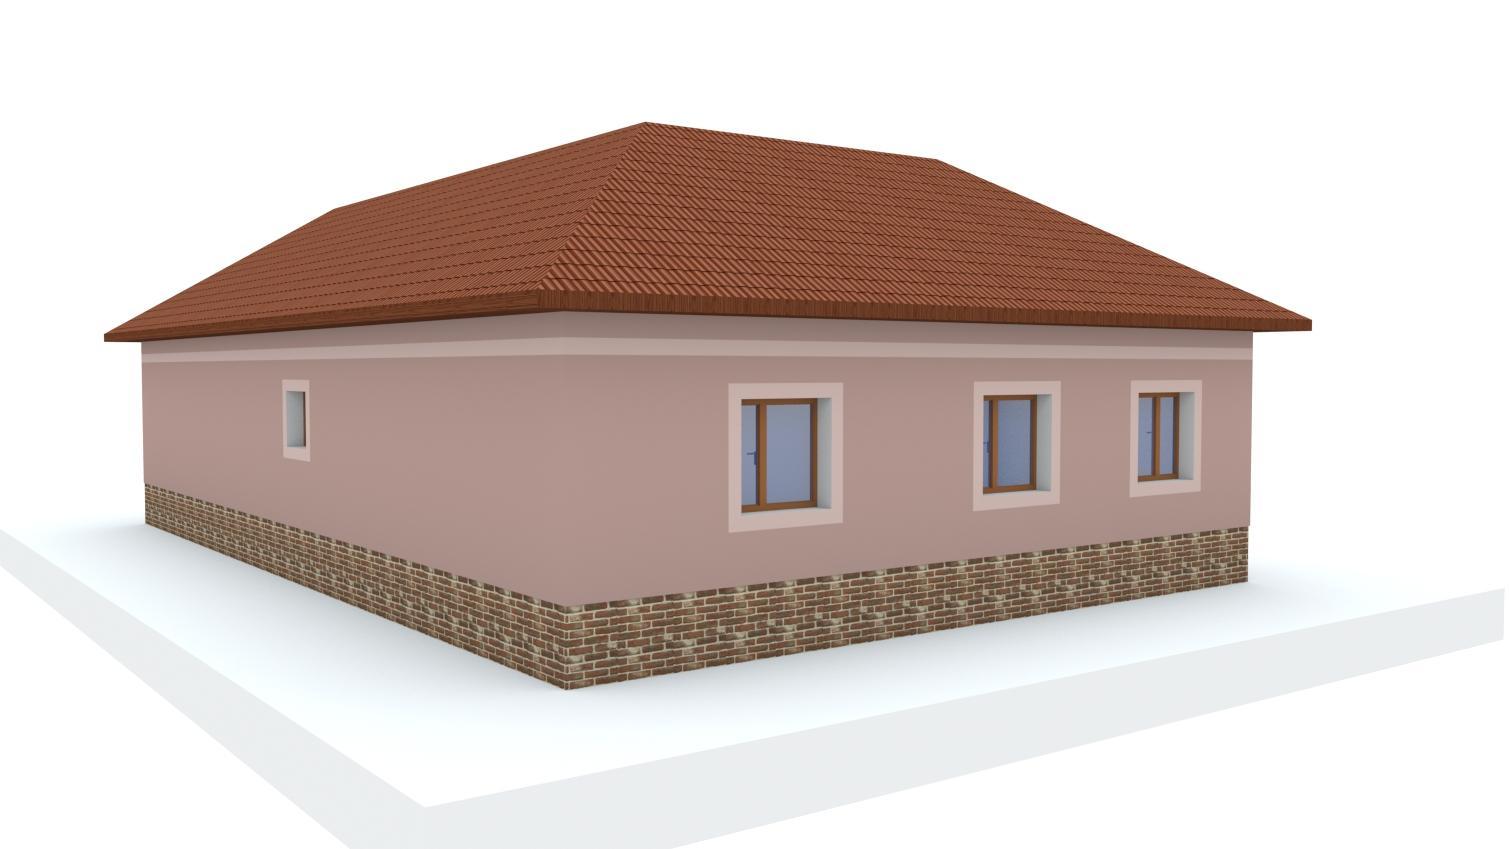 Návrh fasády rodinného domu - Obrázok č. 20